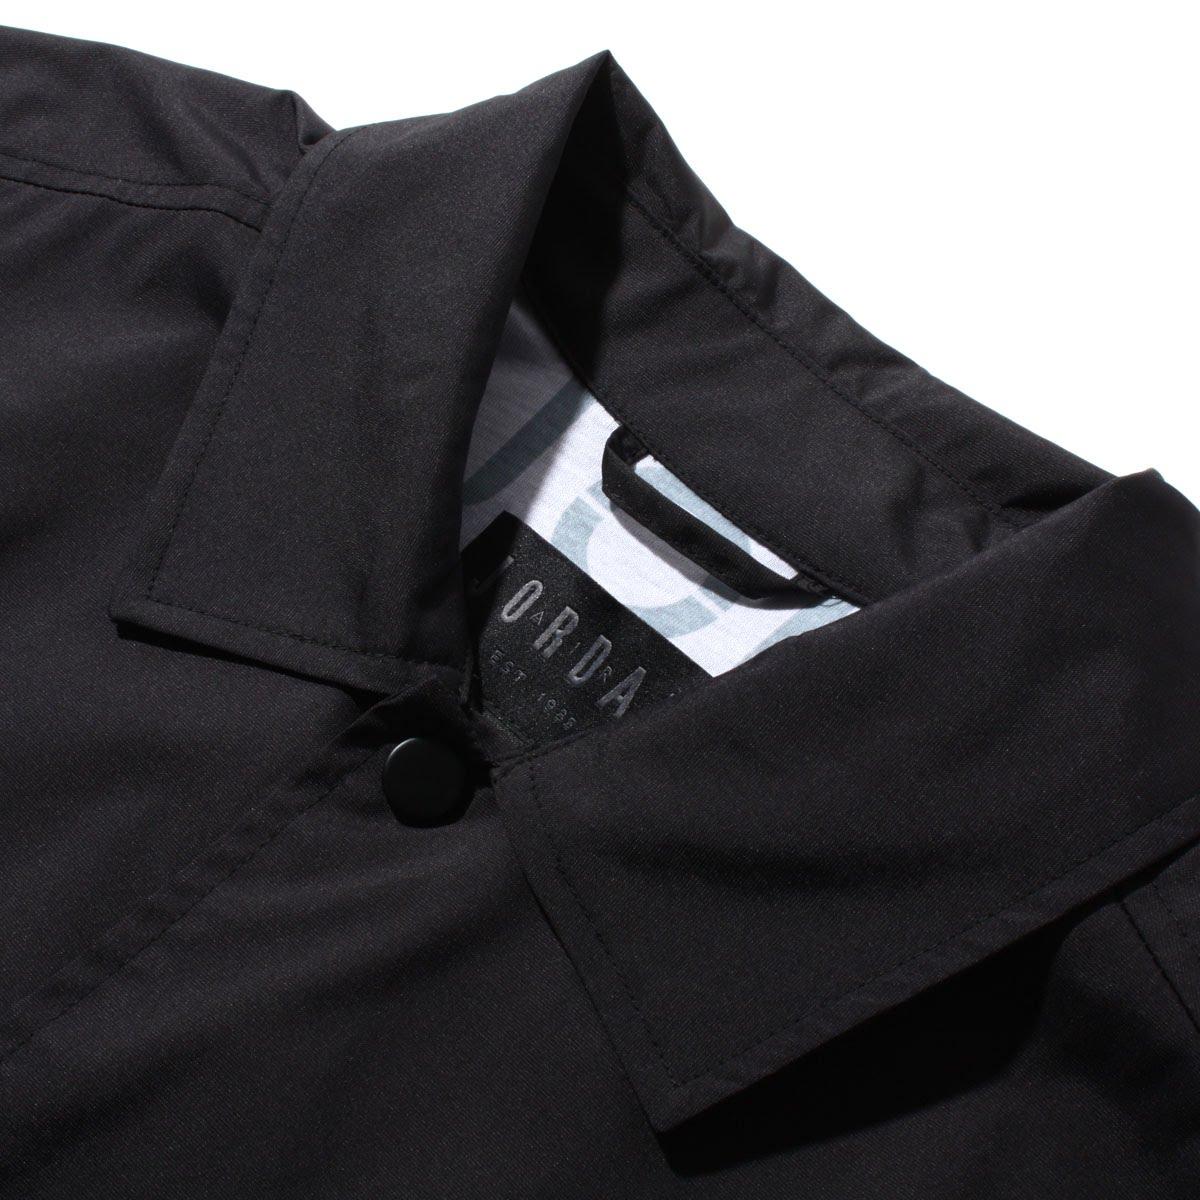 7e11d6a7a3b63a NIKE JUMPMAN COACHES JKT (Nike Jordan jump man coach jacket) BLACK WHITE  18SP-I